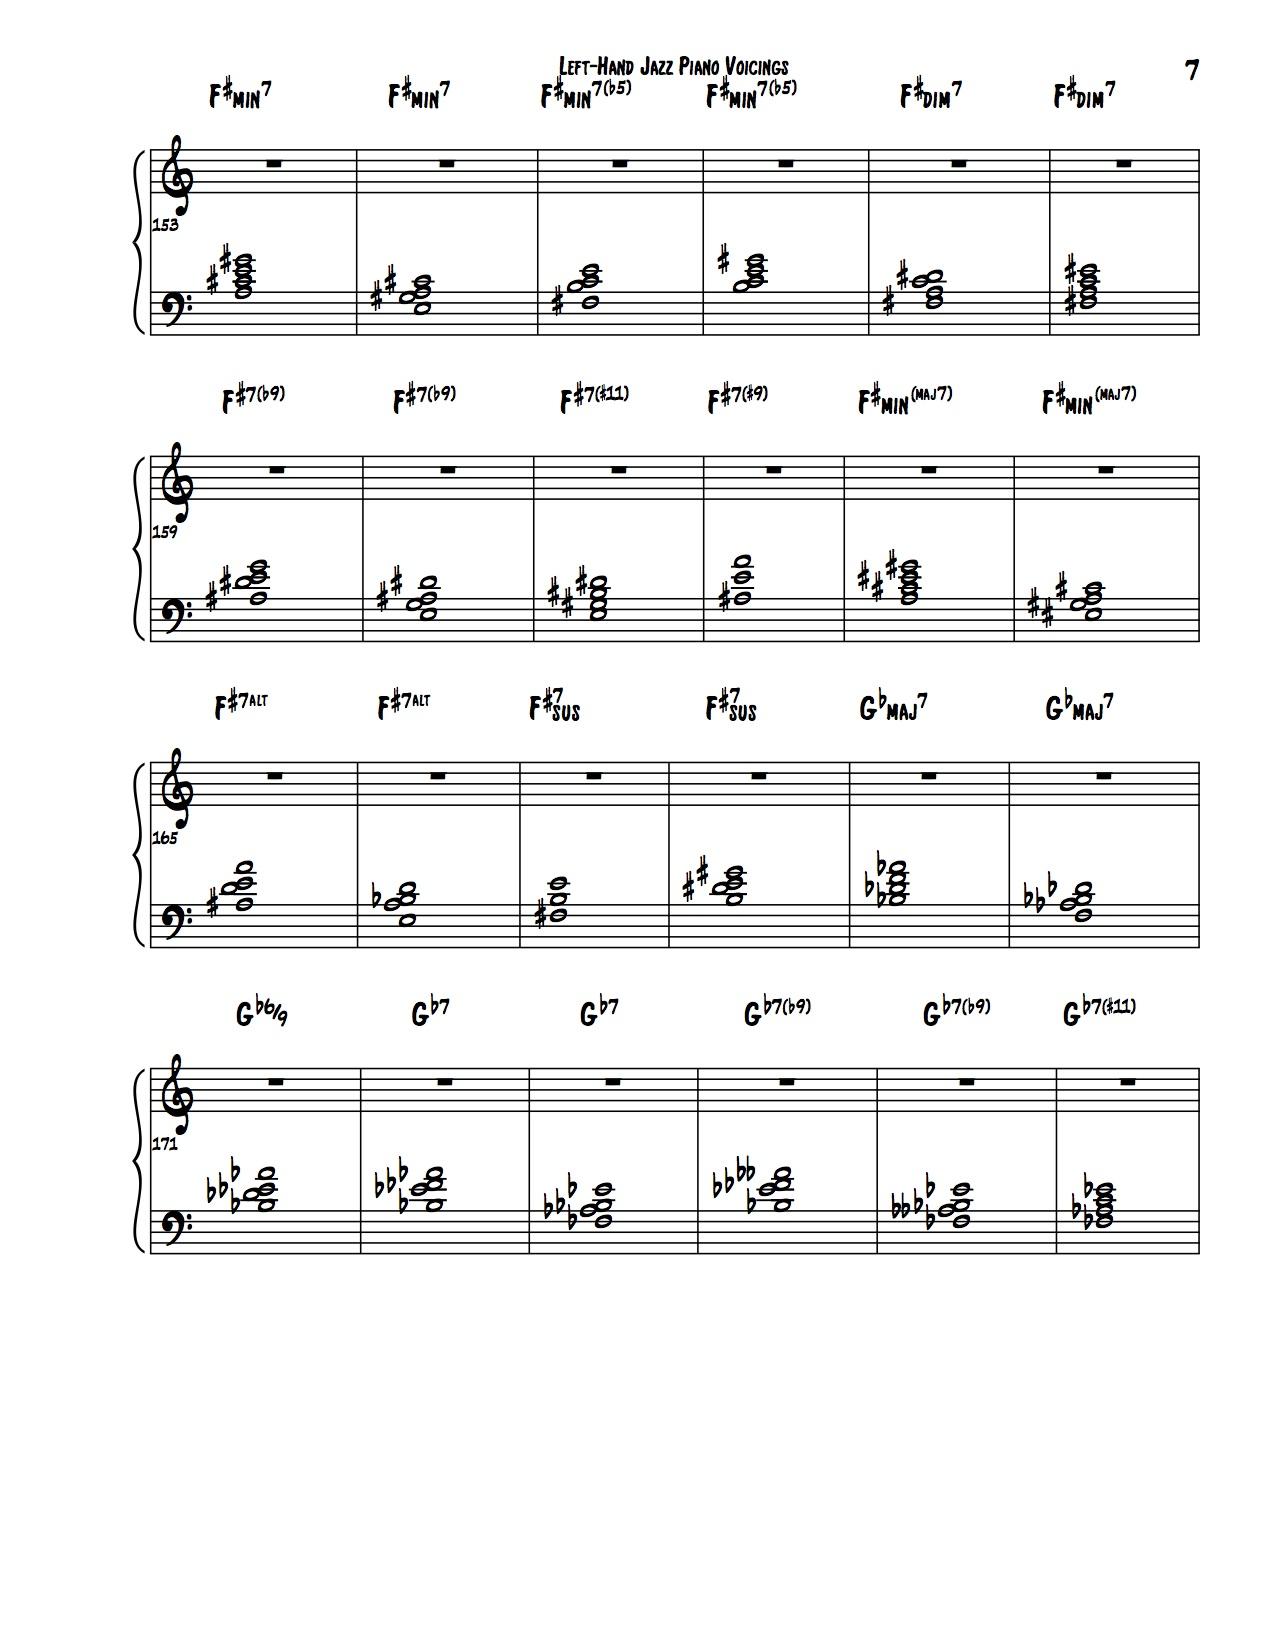 Encyclopedia of left hand jazz piano voicings learn jazz standards encyclopedia of left hand voicings 7 hexwebz Image collections